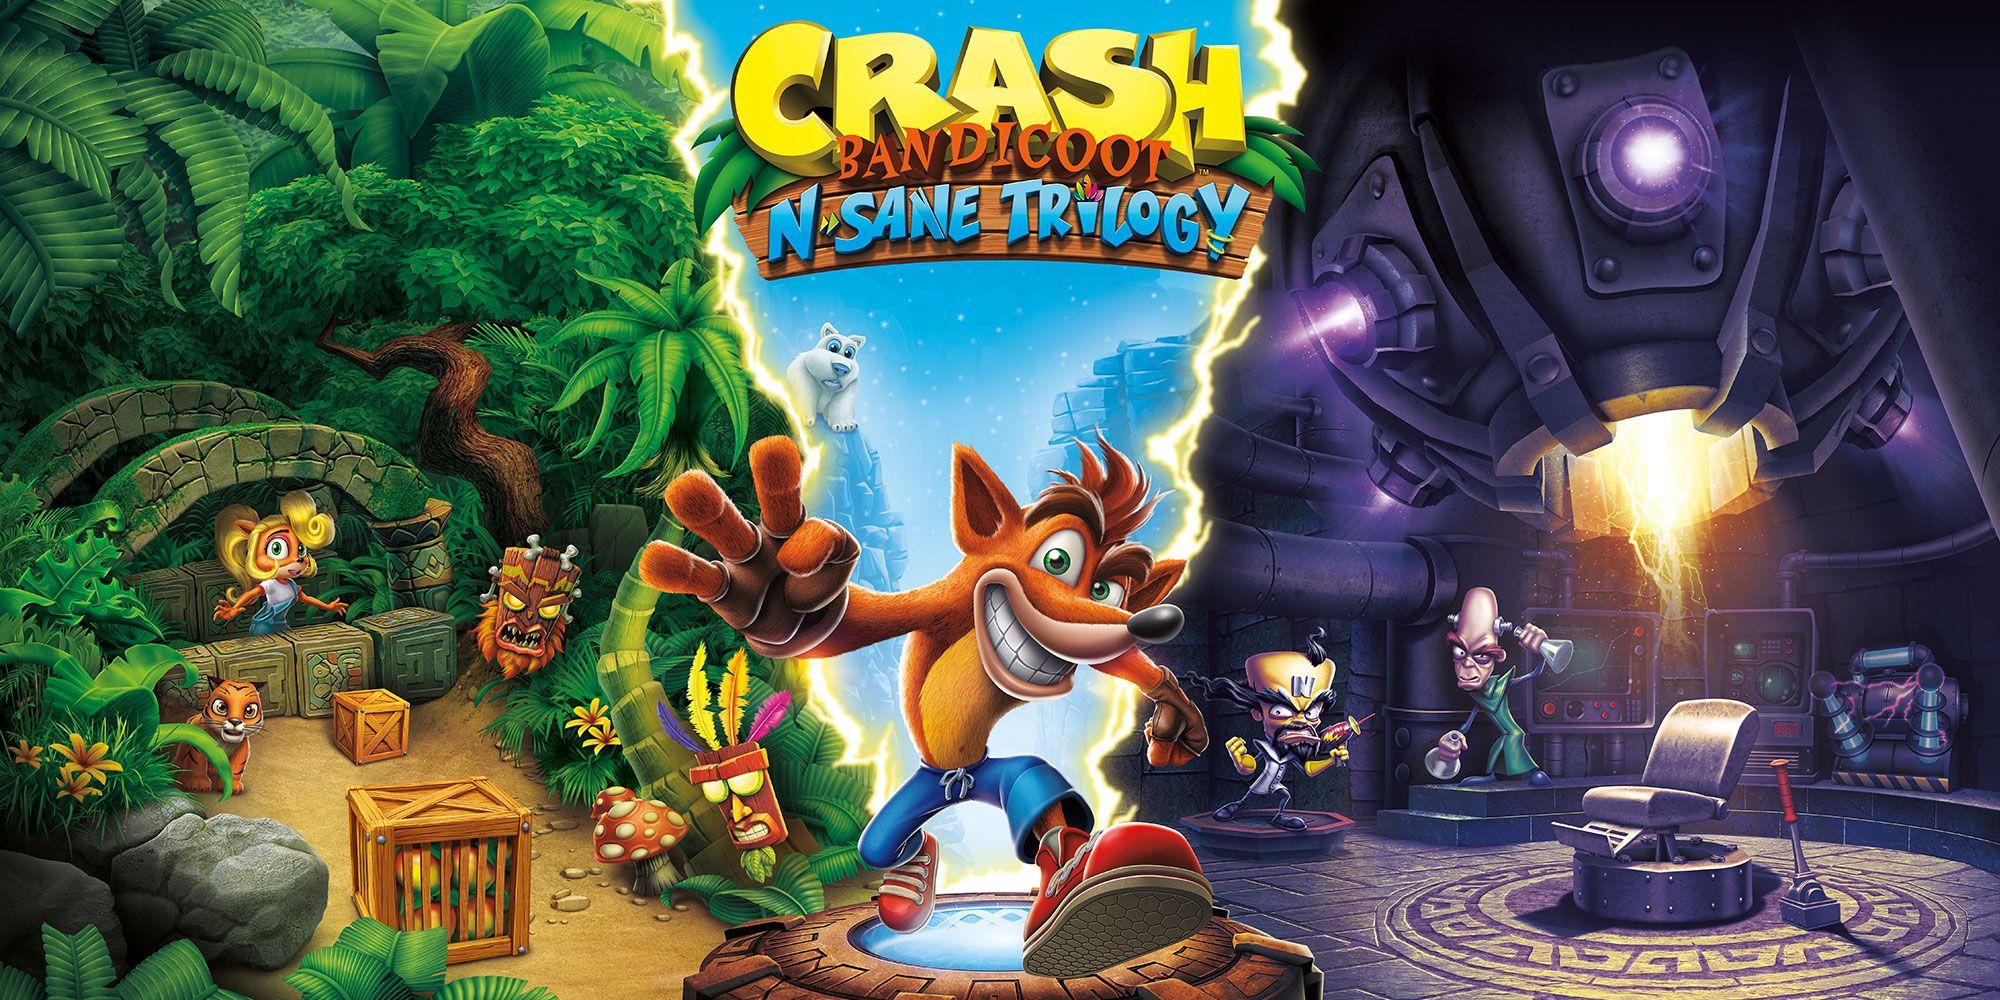 Crash Bandicoot™ N. Sane Trilogy Switch